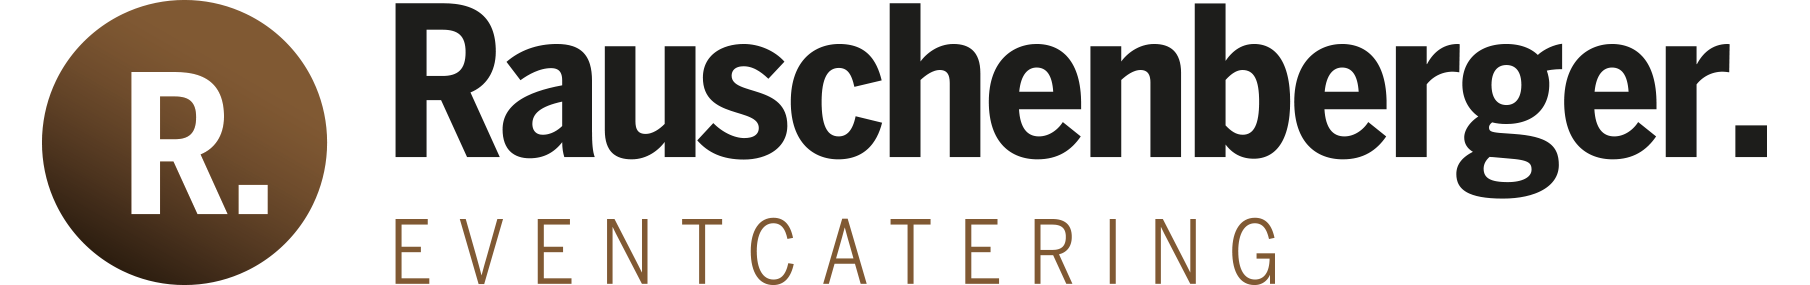 Rauschenberger Catering & Restaurants GmbH & Co. KG